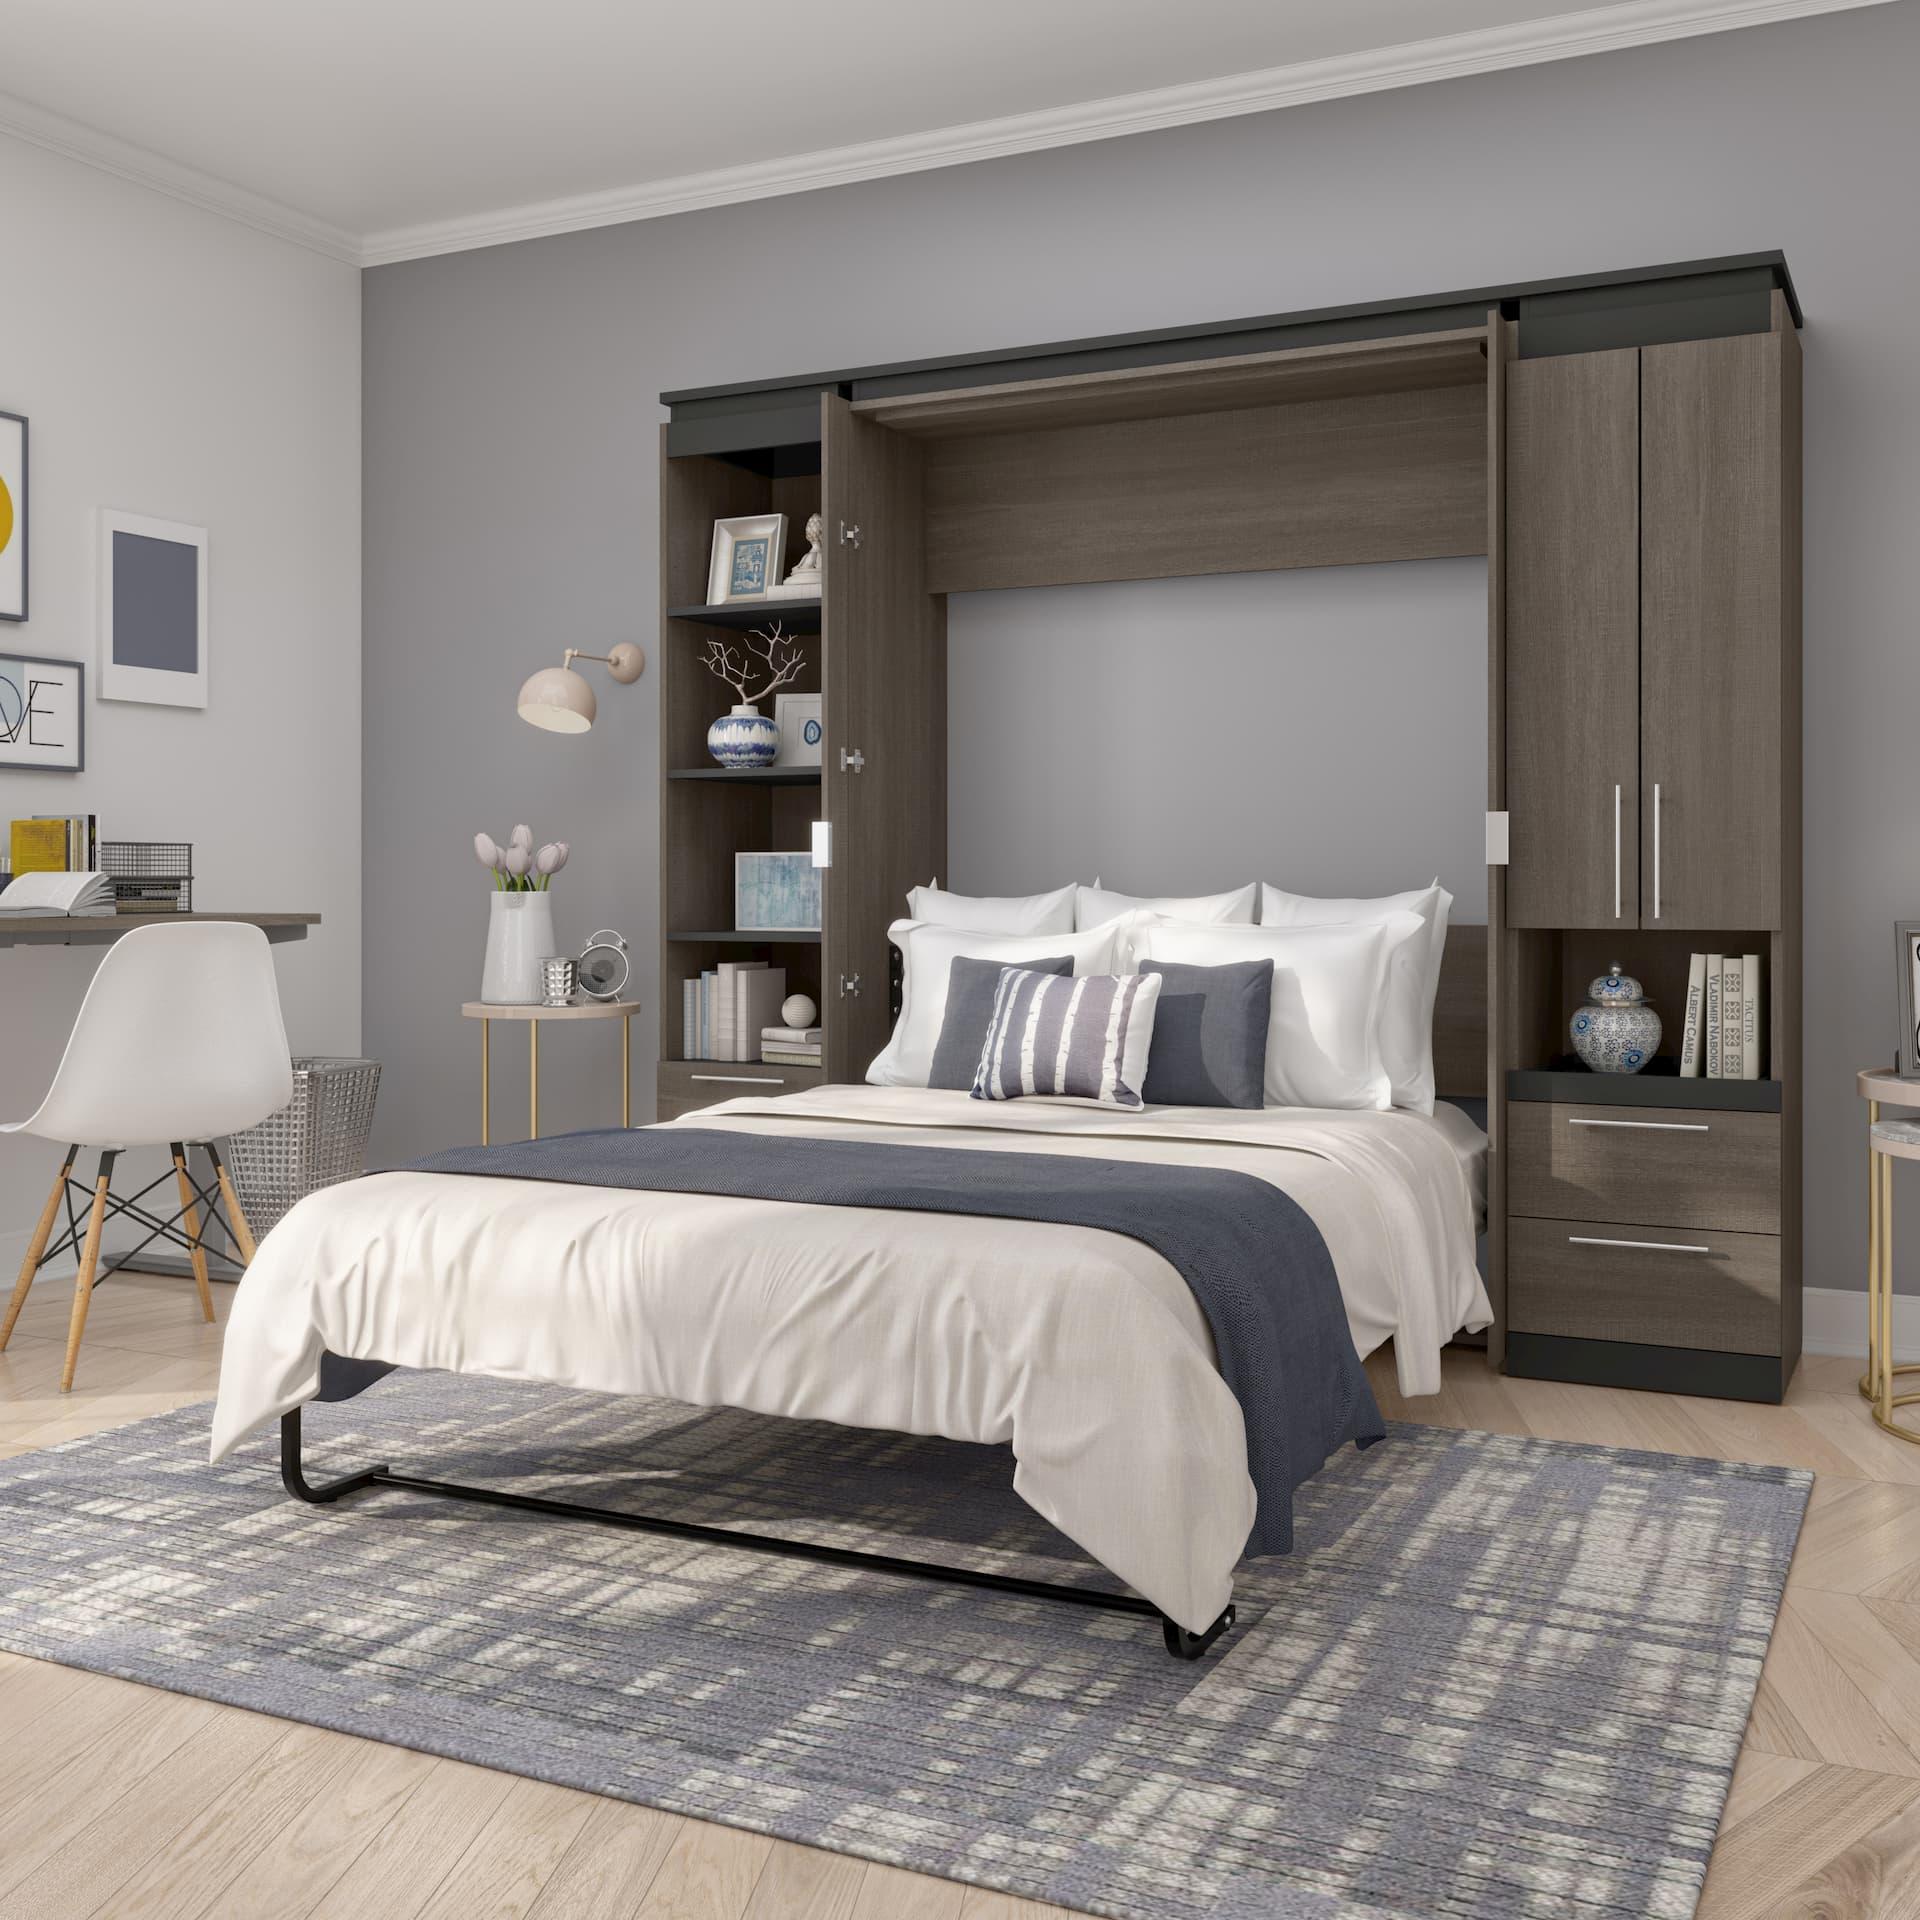 Guest bedroom with a Bestar Murphy Bed